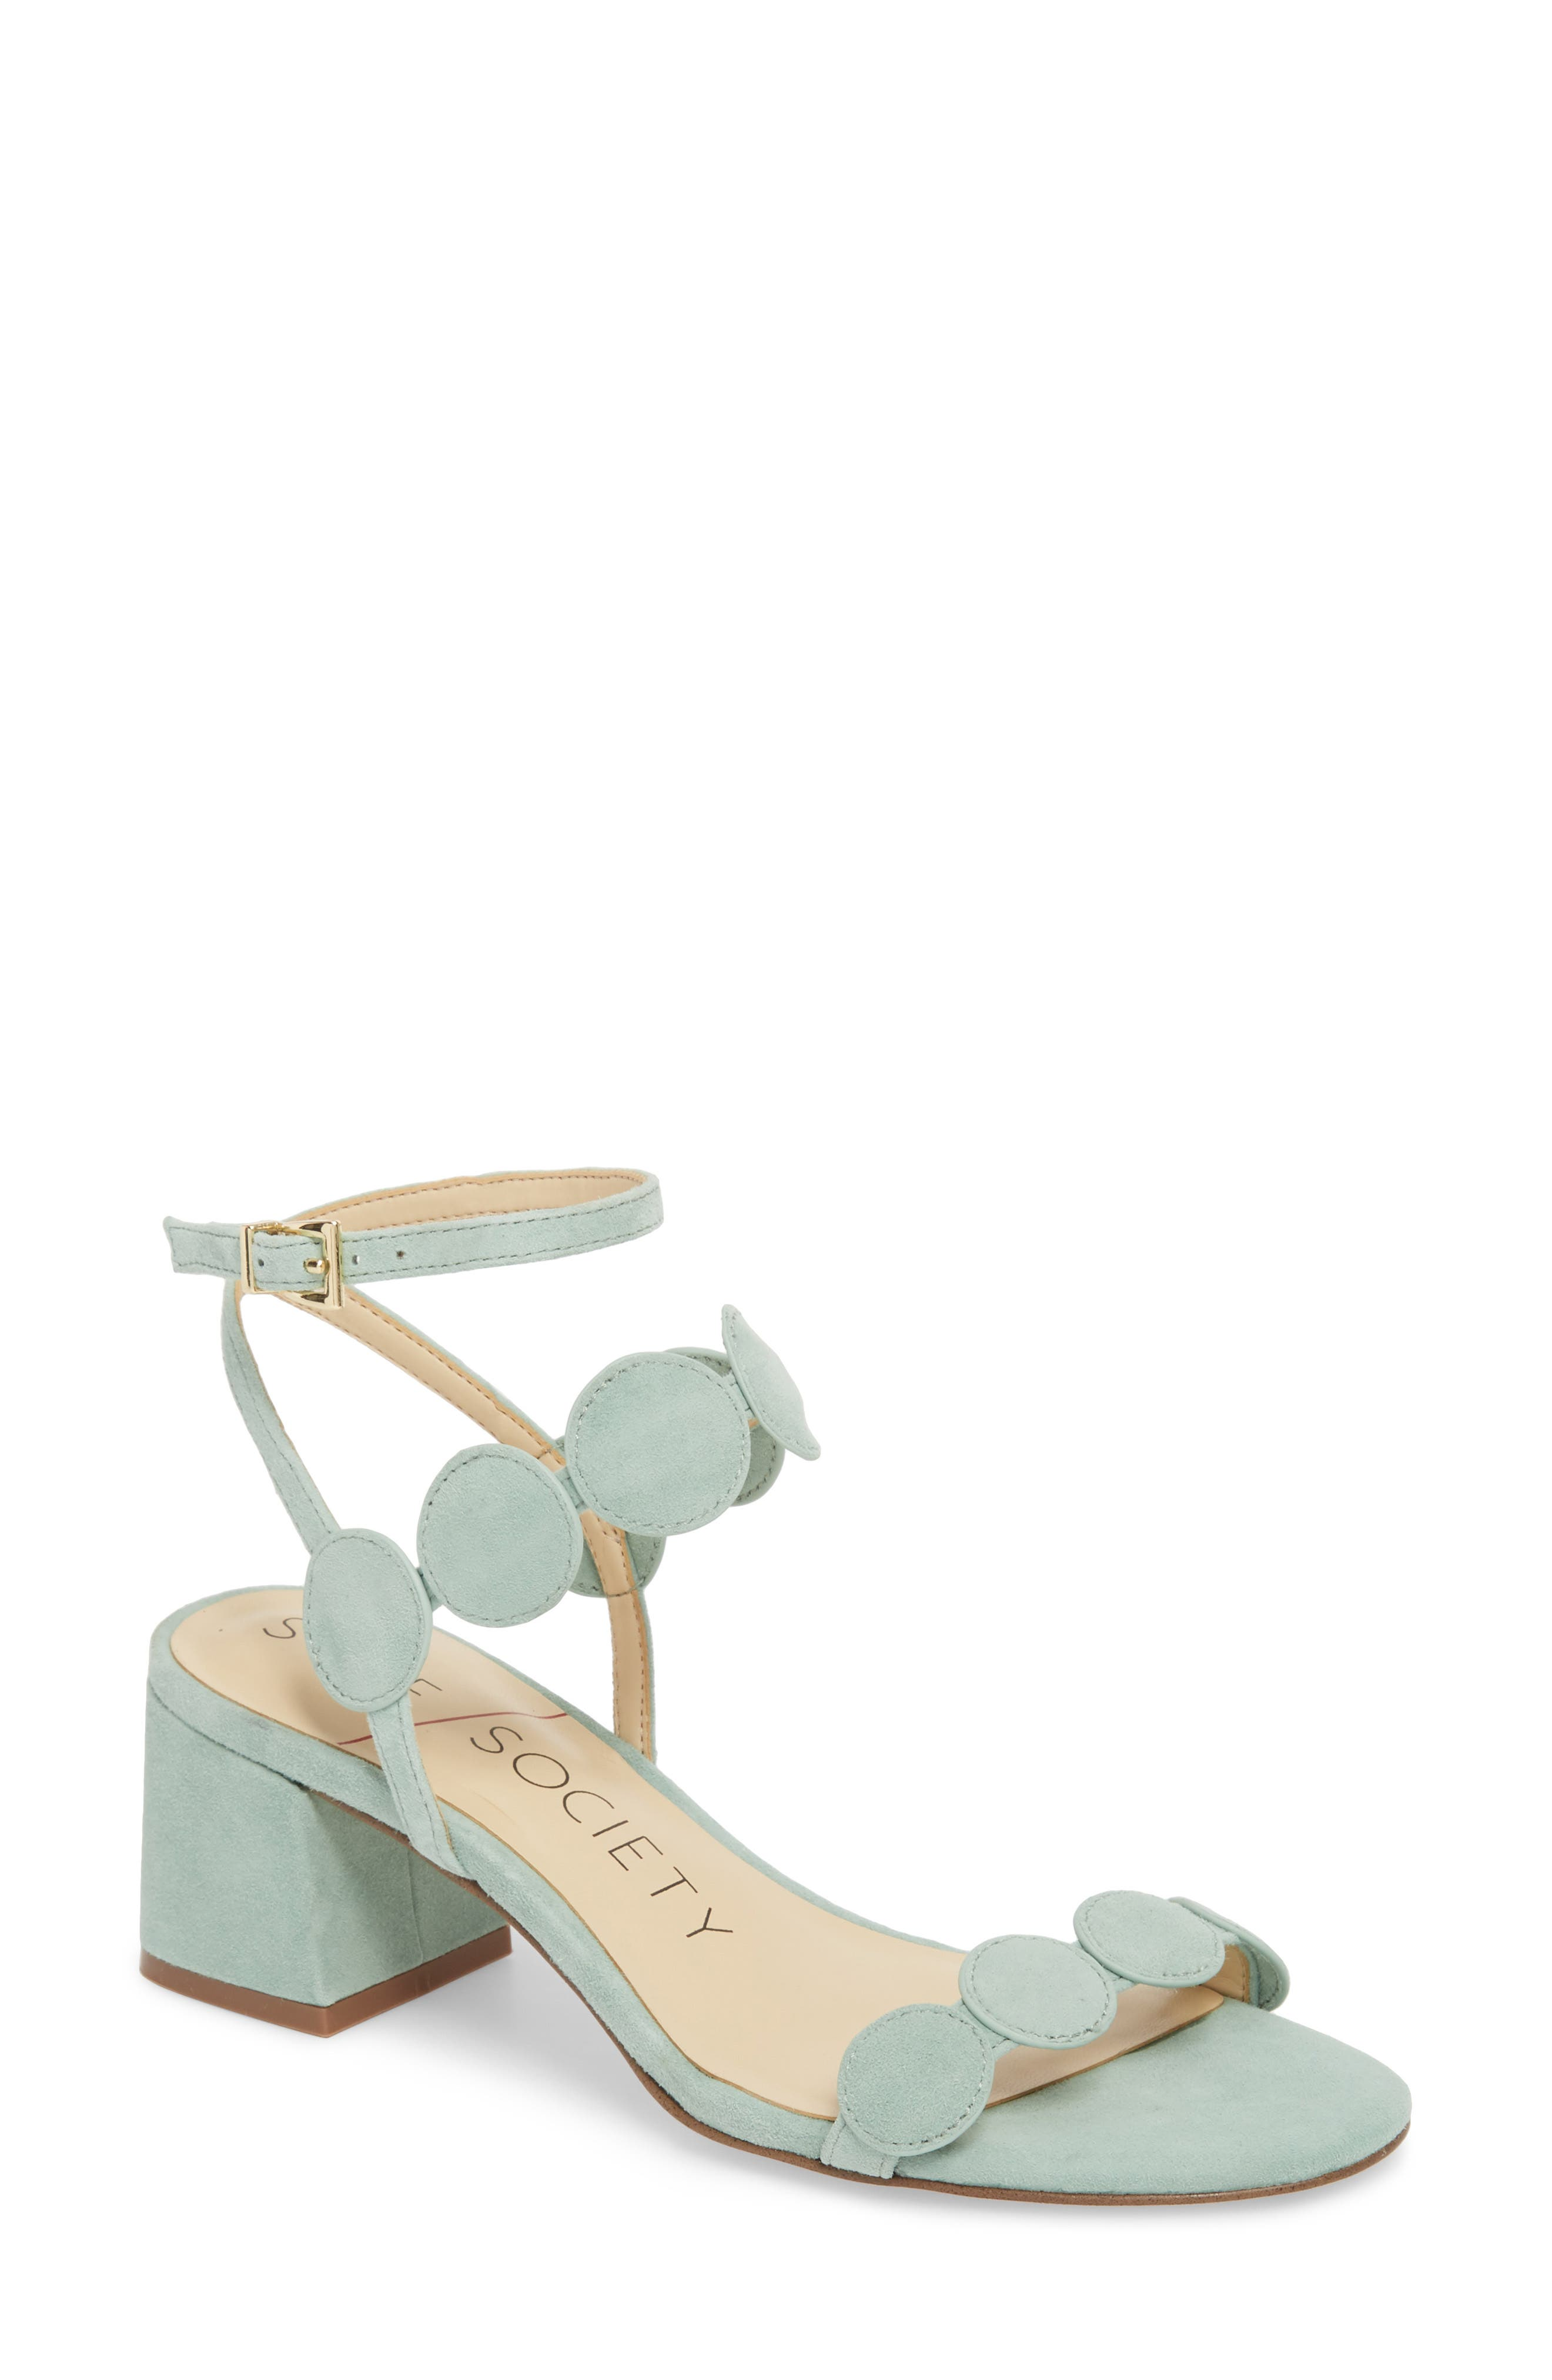 Shea Block Heel Sandal,                         Main,                         color, Sage Green Suede